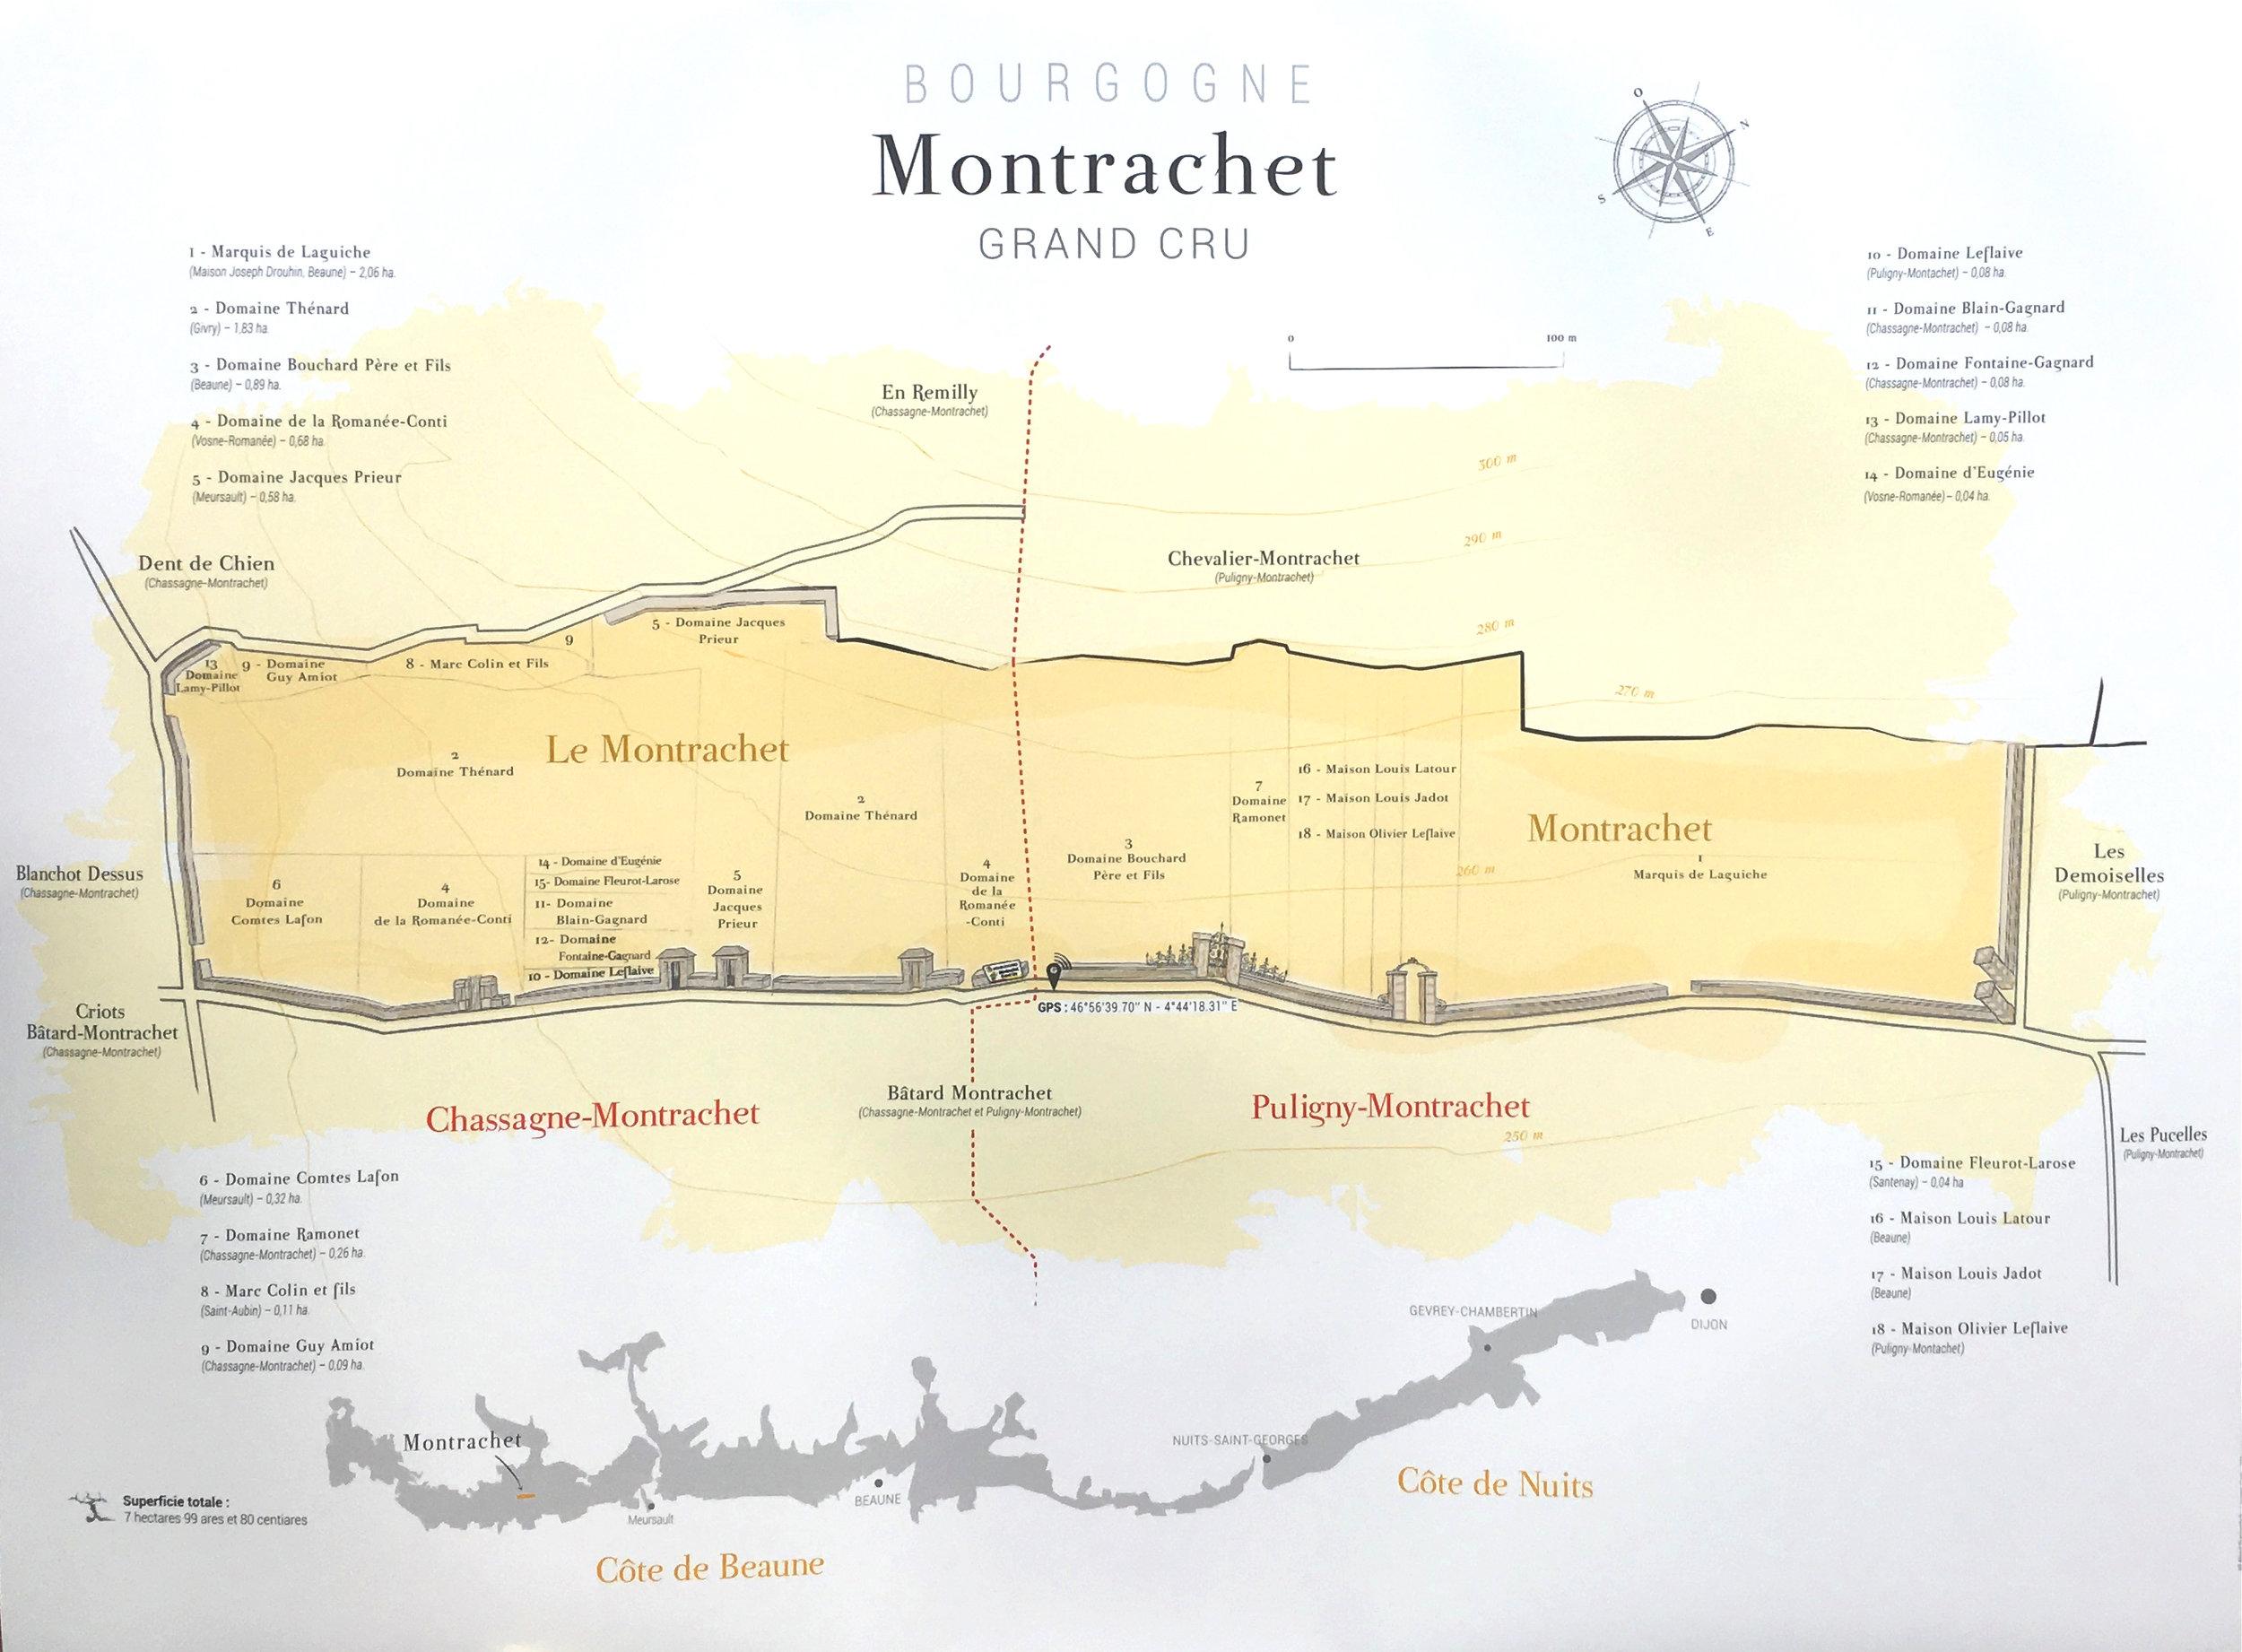 Montrachet: вино Дюма-отца, Альфреда Хичкока и Ганнибала Лектора